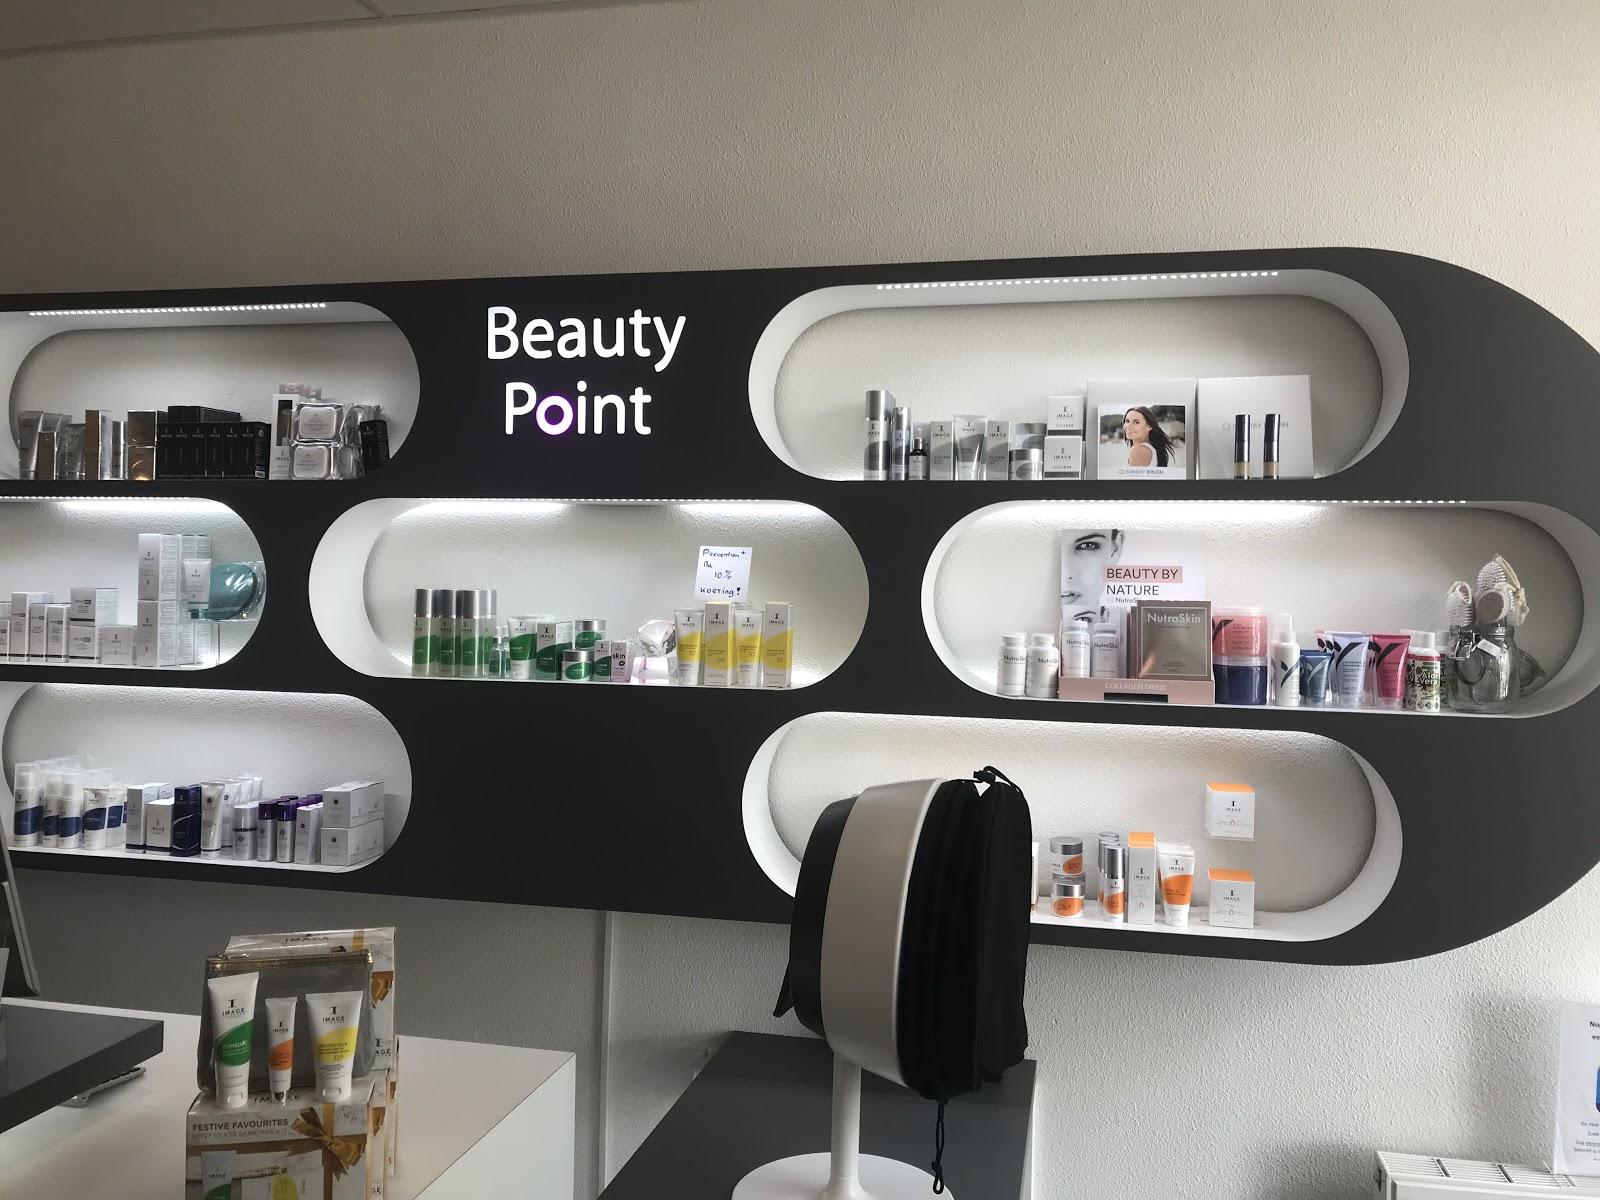 Vitamine c gezichtsbehandeling beautysalon Beautypoint groningen